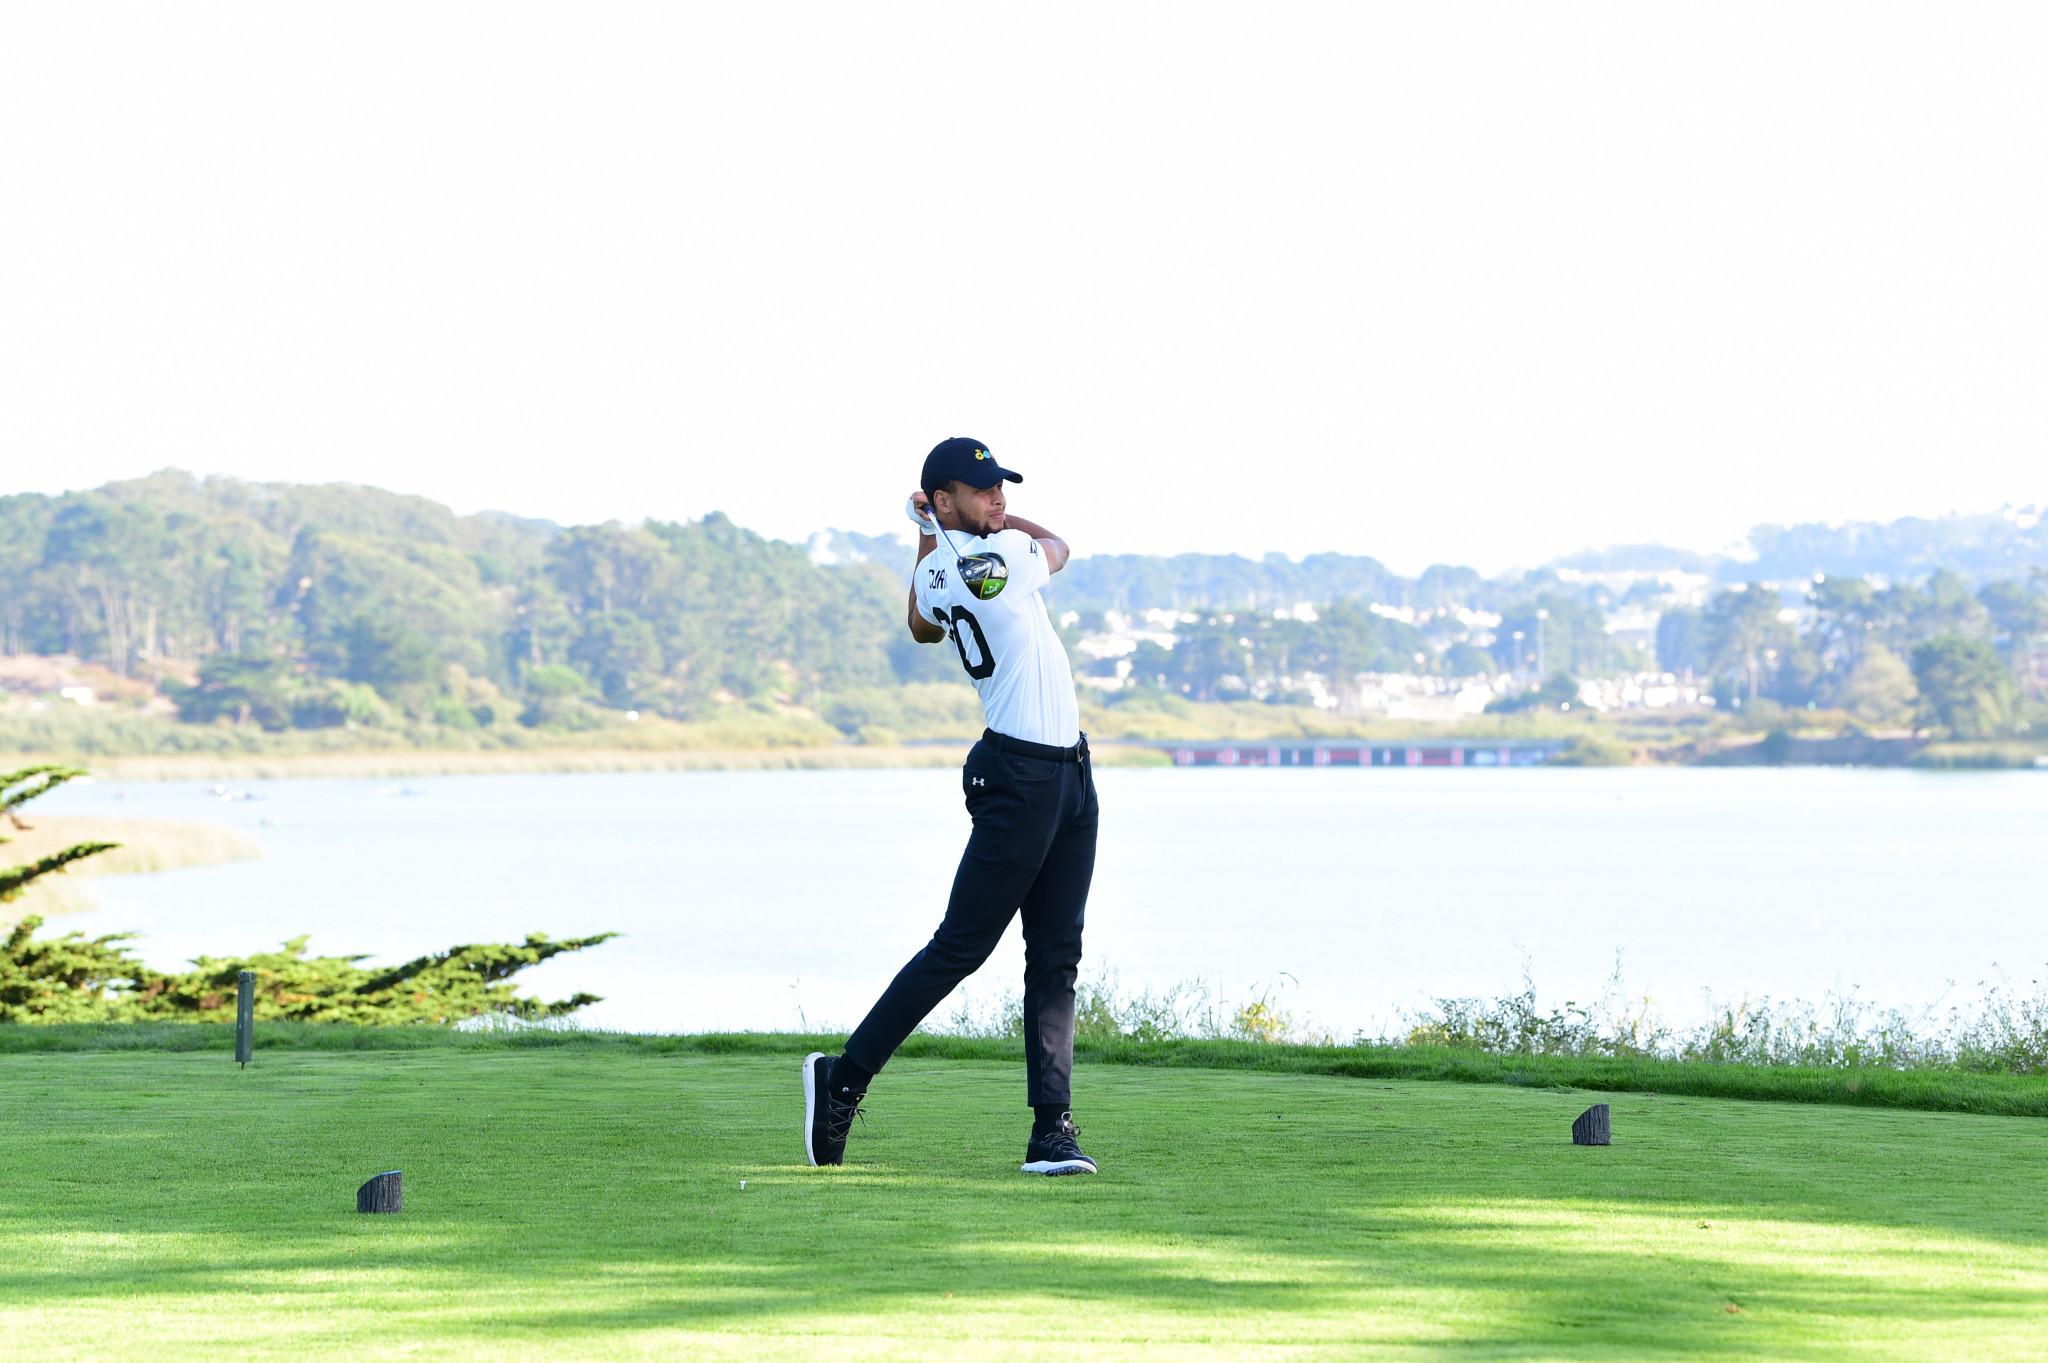 PGA Championship venue set to re-open after coronavirus restriction